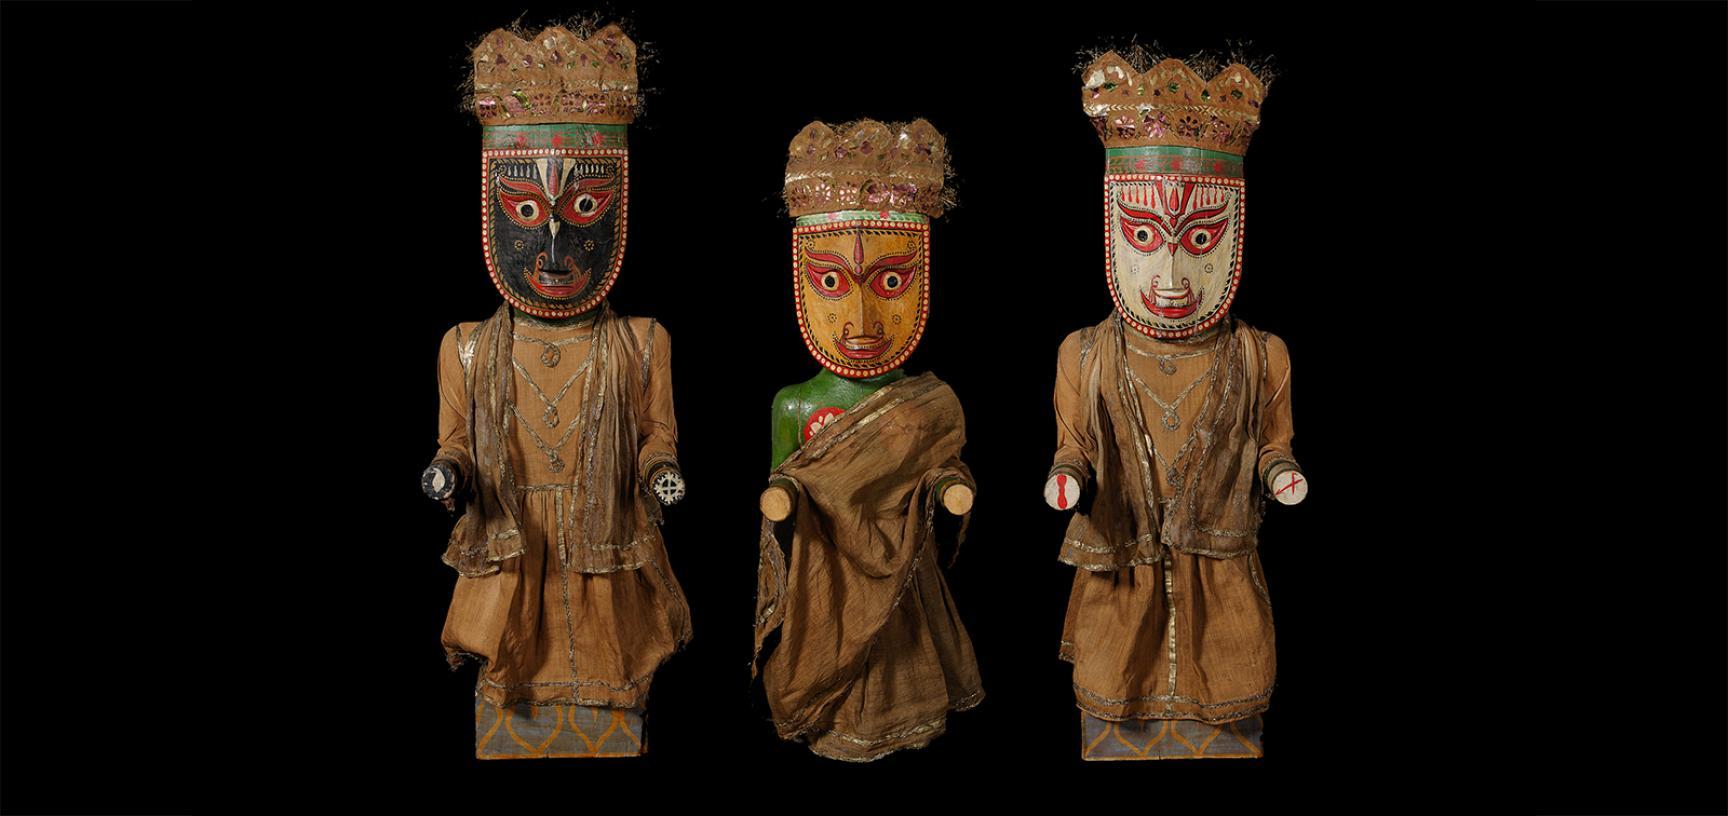 Jagannath (1894.28.1), Subhadra (1894.28.2) and Balabhadra (1894.28.3) after conservation